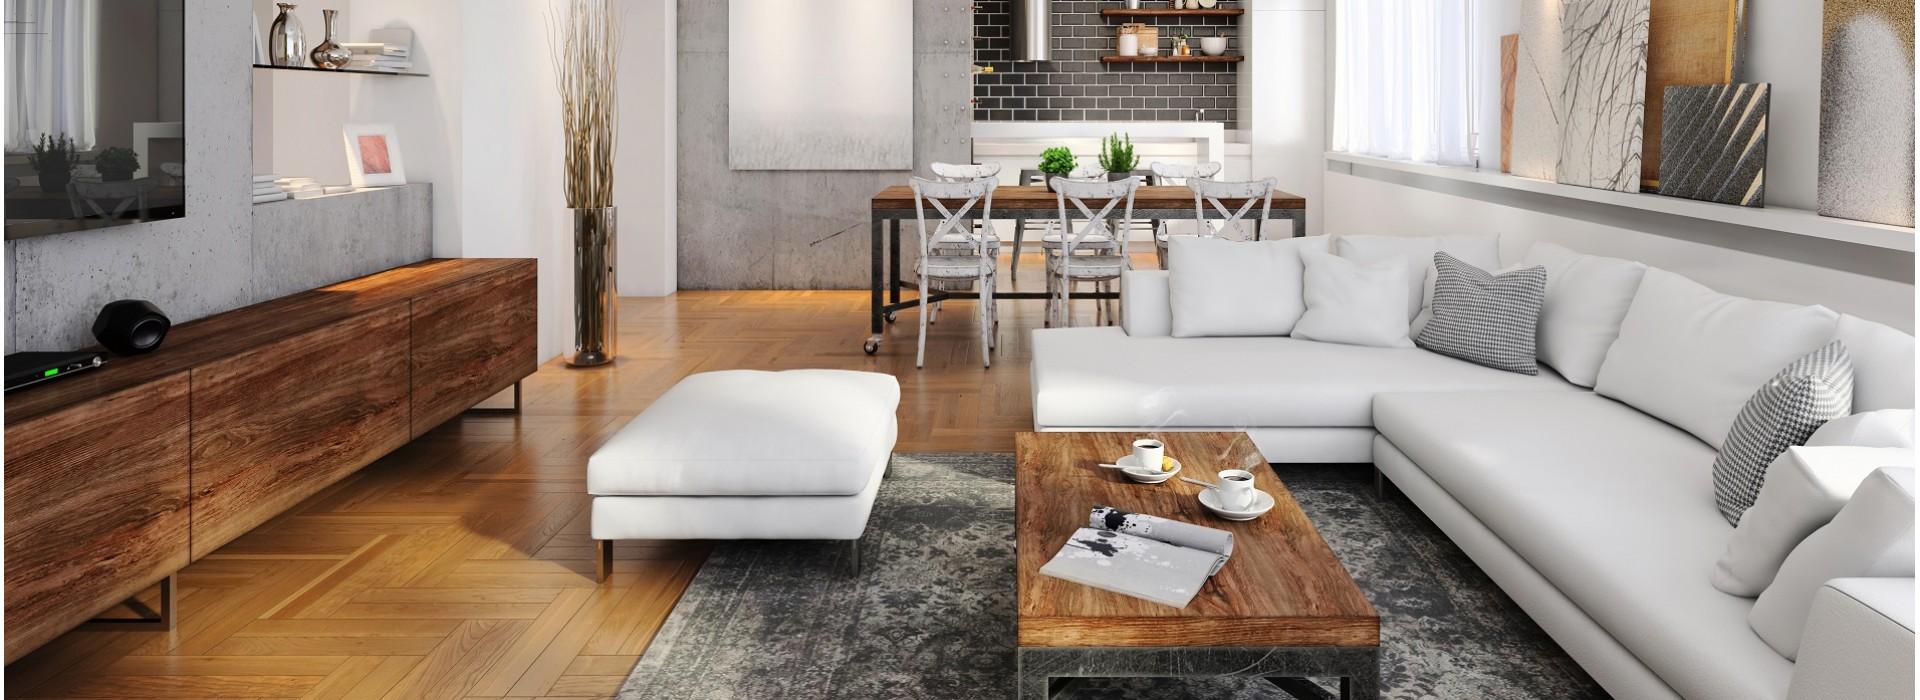 You are currently viewing רהיטים מעוצבים לבית – הגיע הזמן לשדרג את הבית